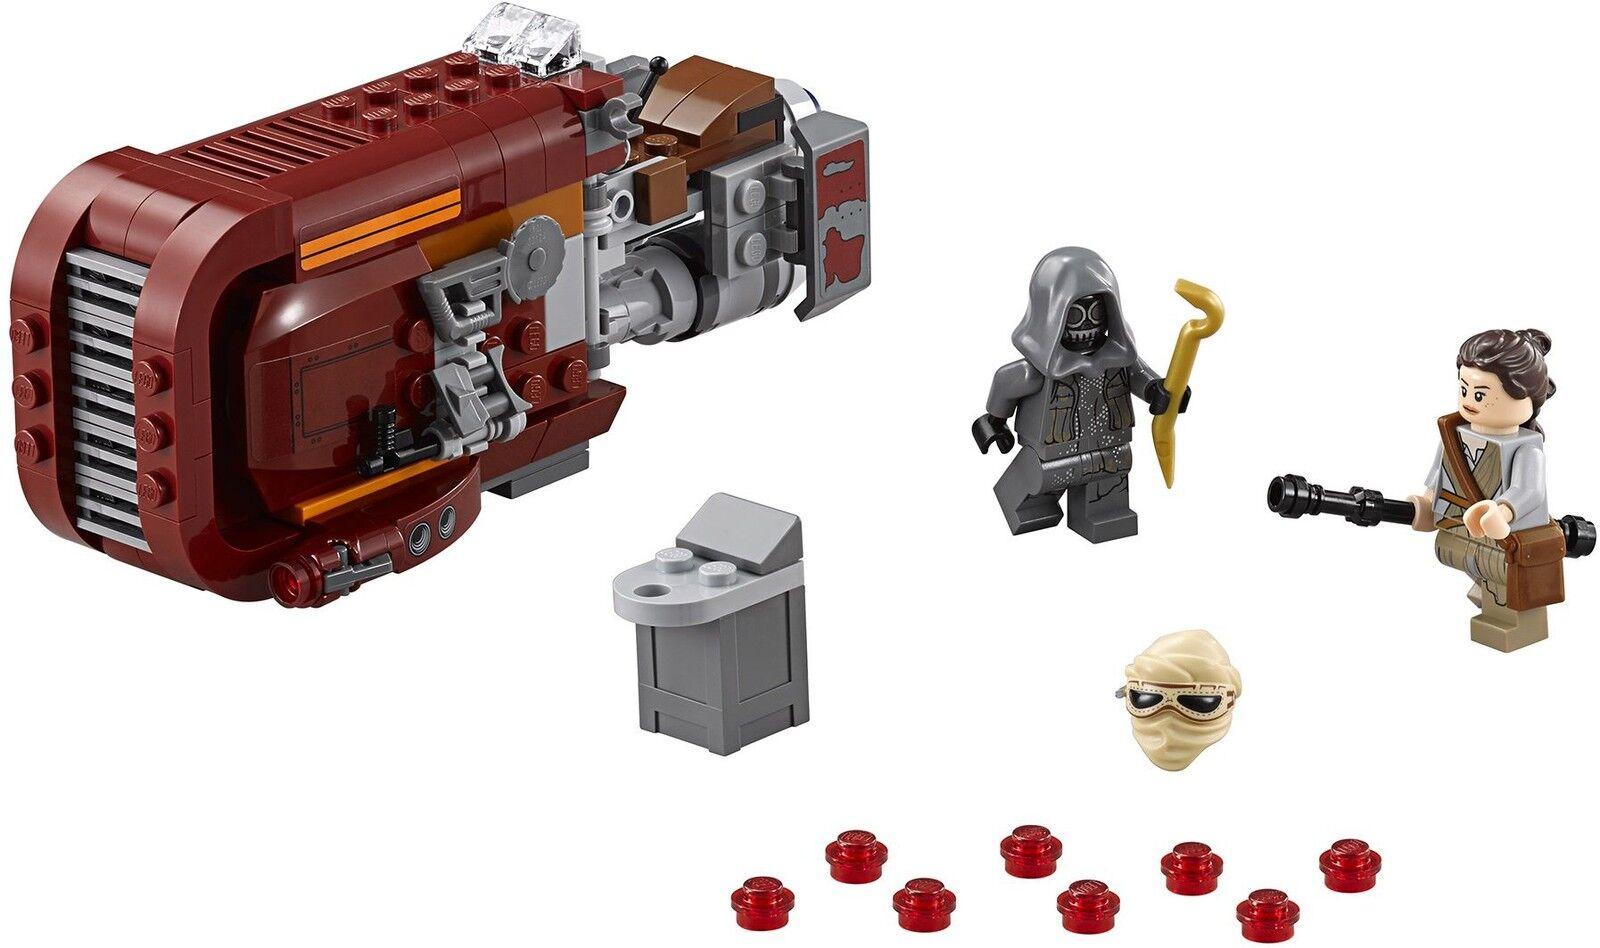 LEGO STAR WARS 75099 Rey's Speeder NUEVO     NEW 3f146f